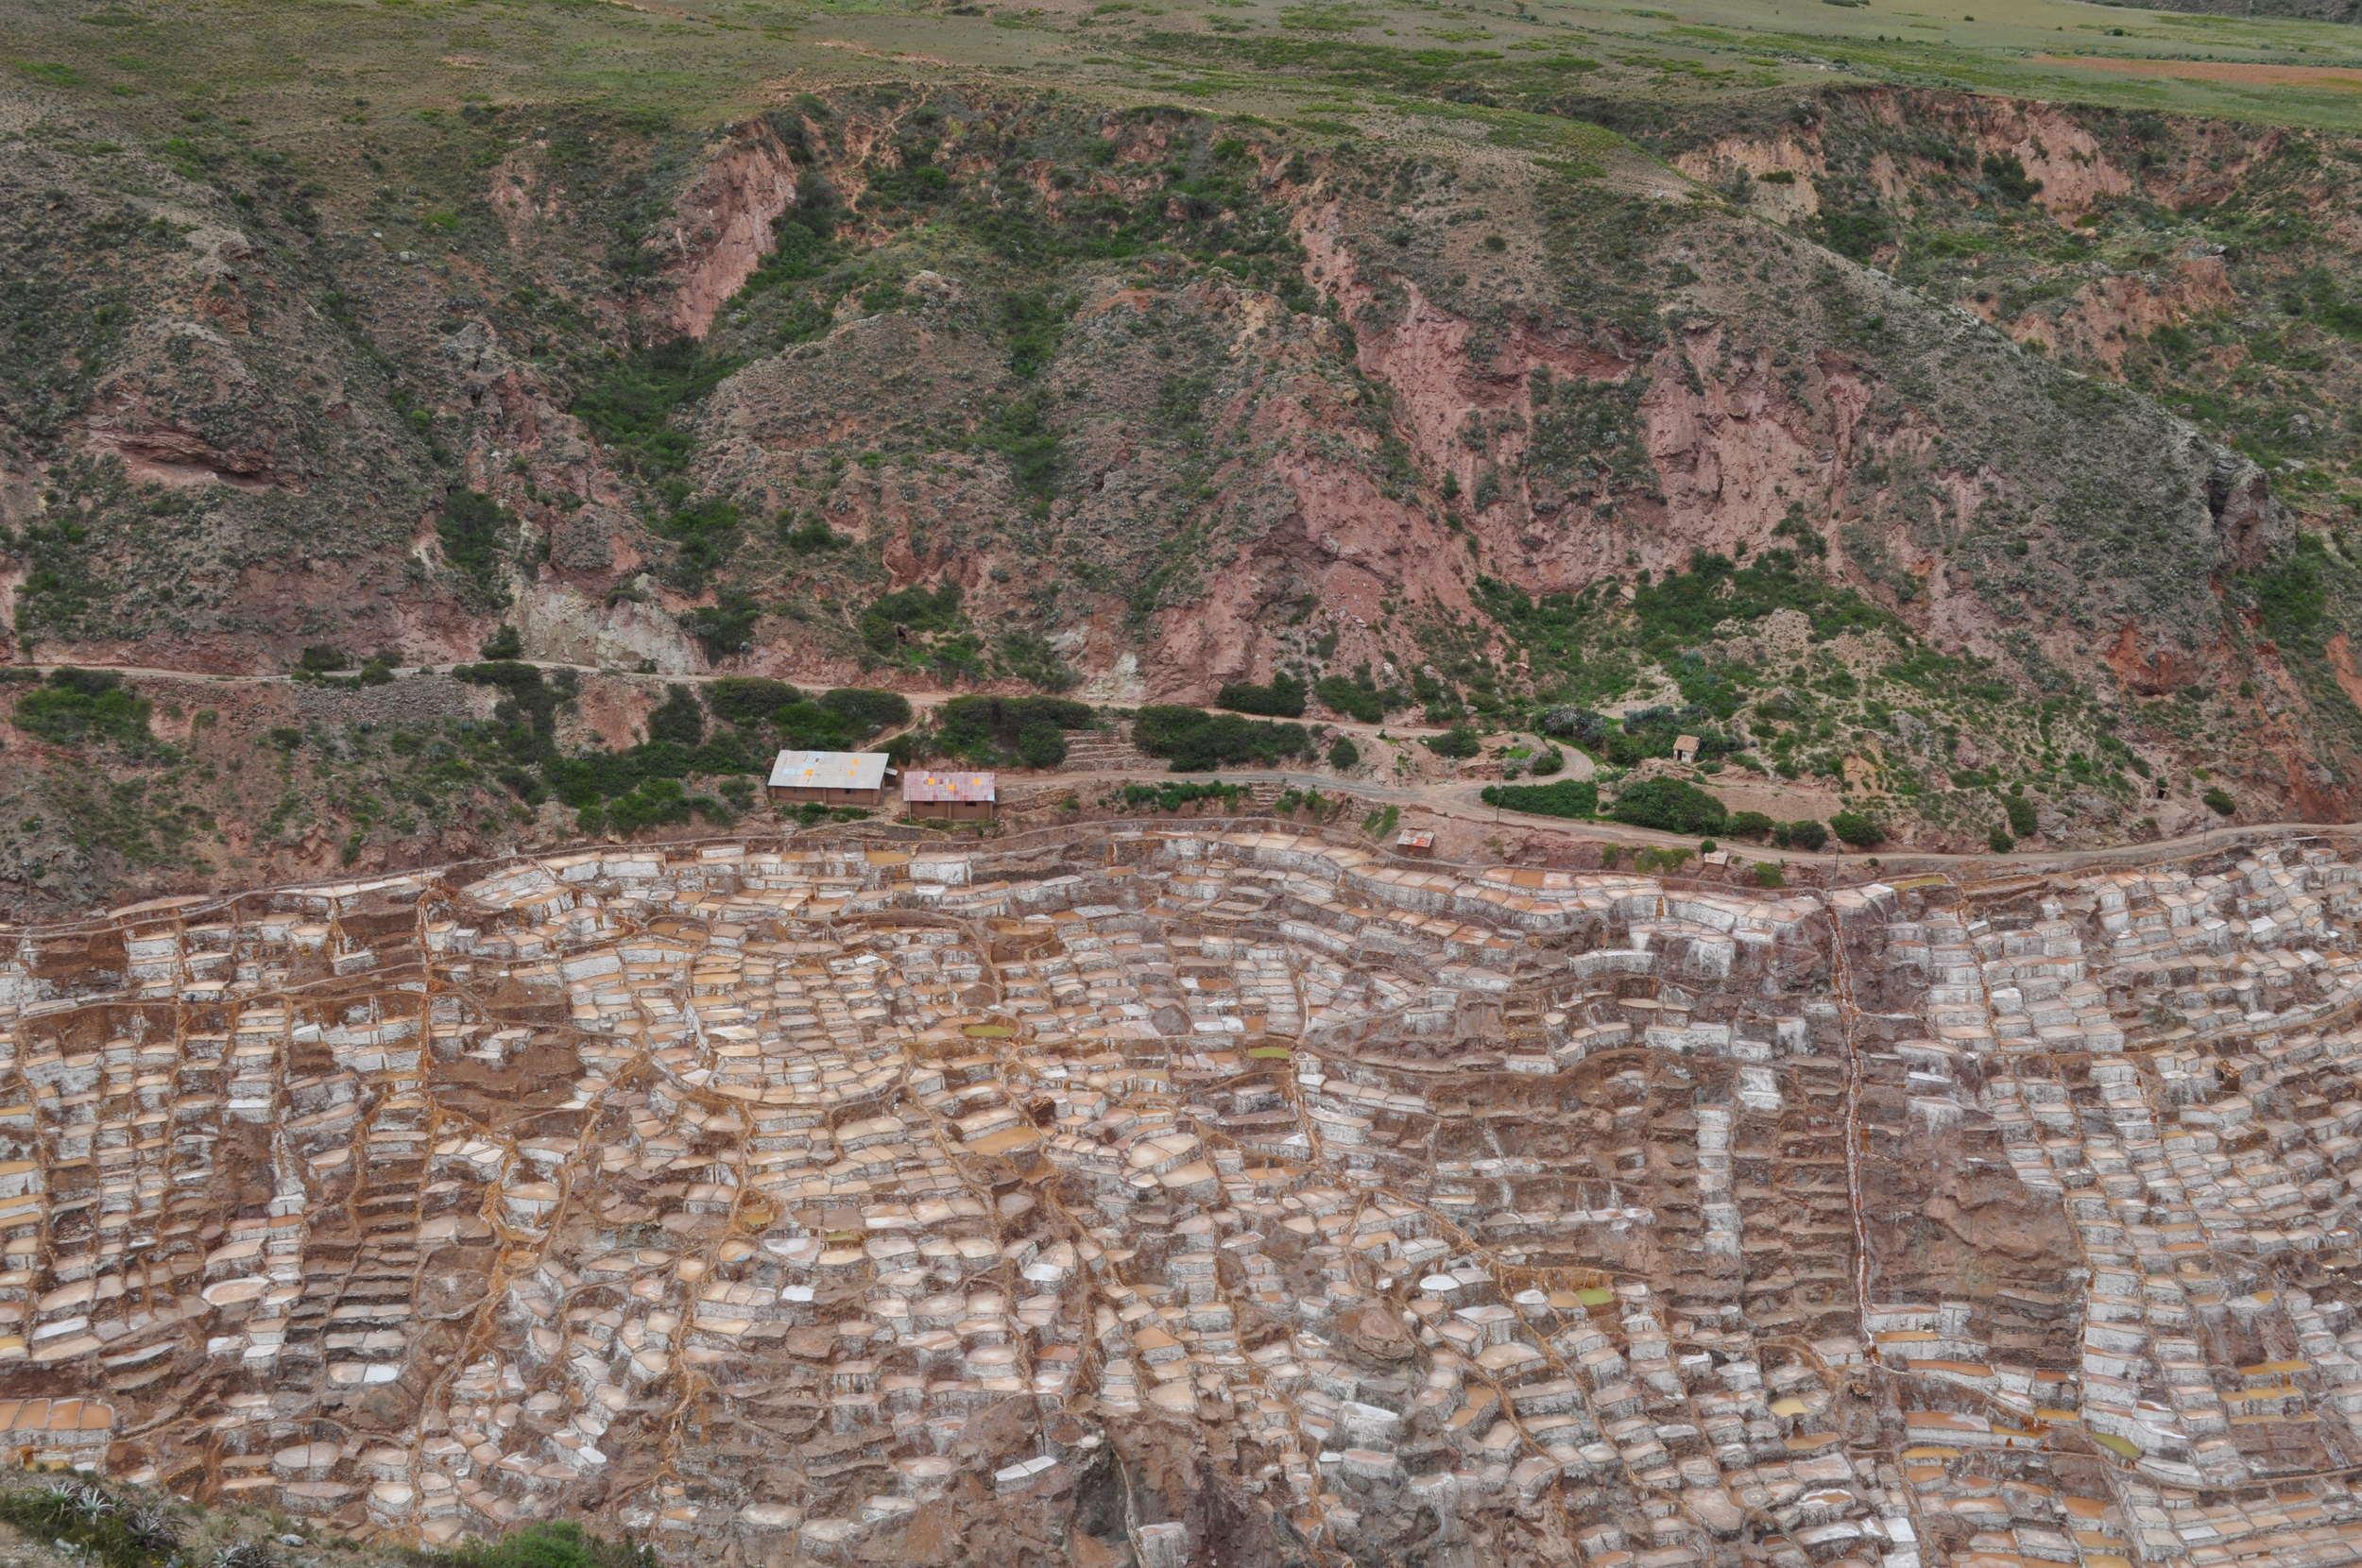 Las minas de sal datan de la época incaica. Foto: Pamy Rojas